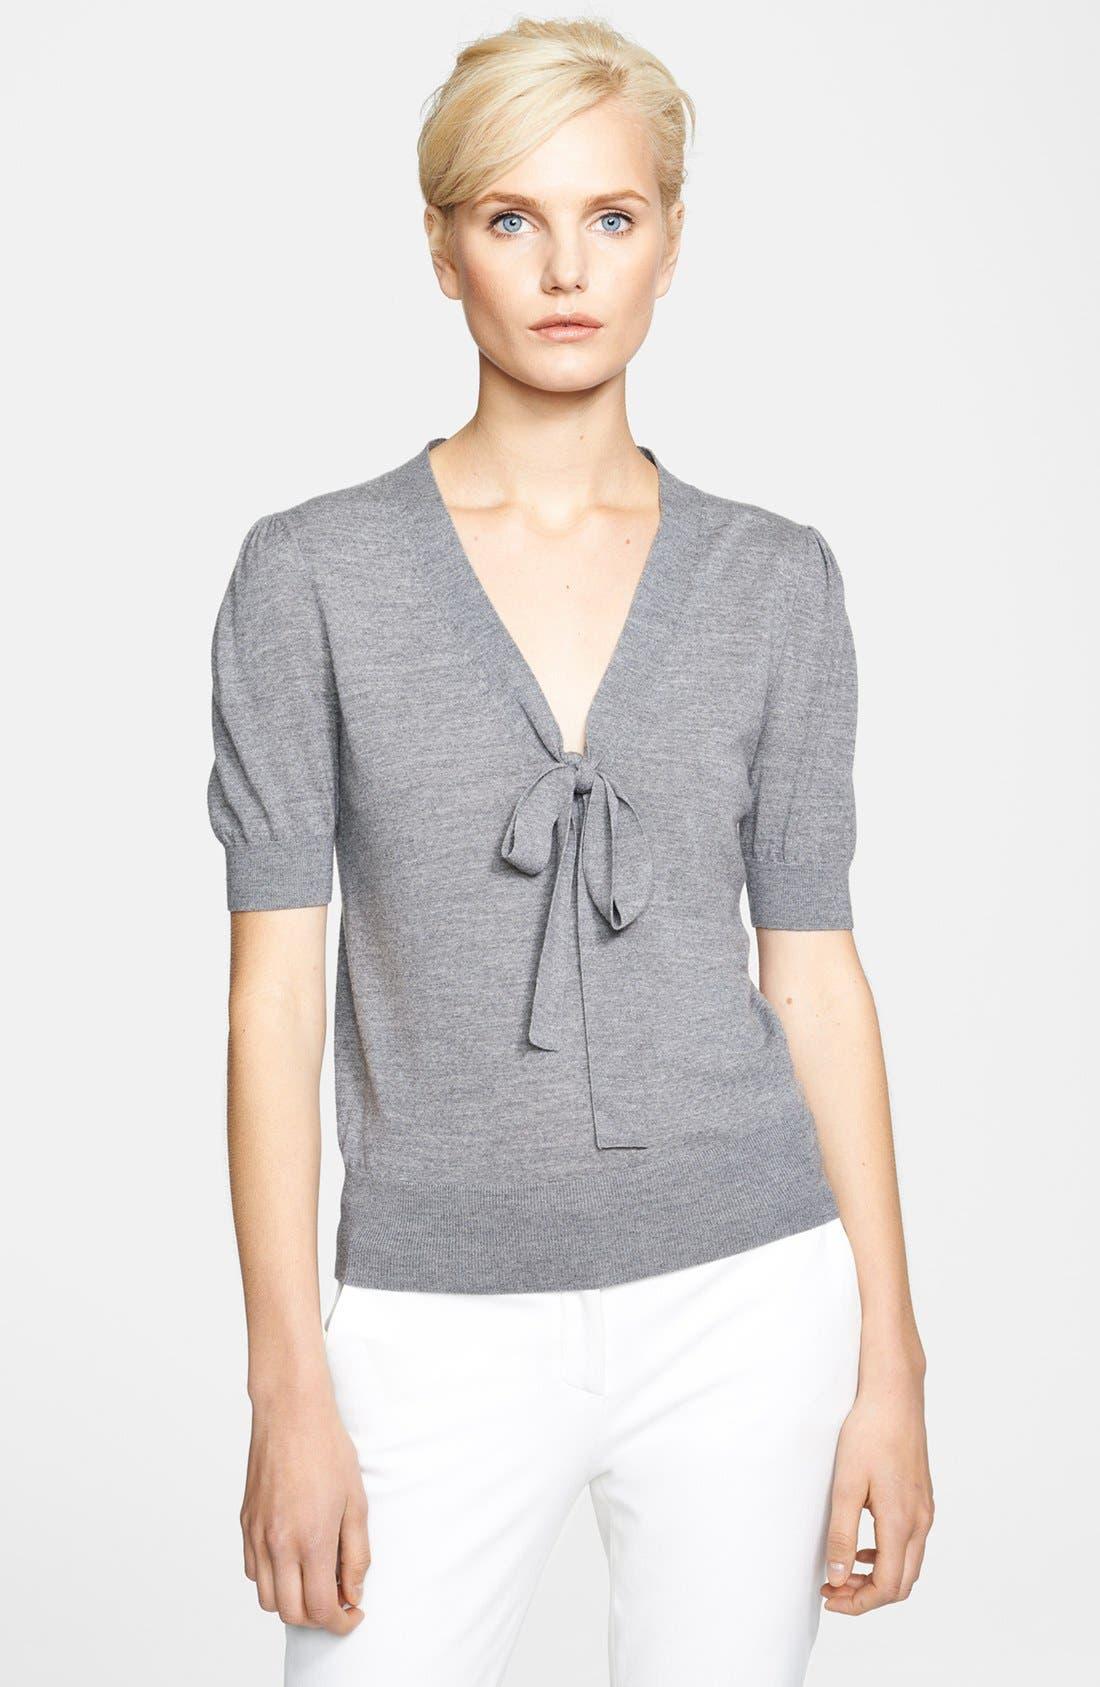 Alternate Image 1 Selected - Michael Kors Merino Wool Pullover